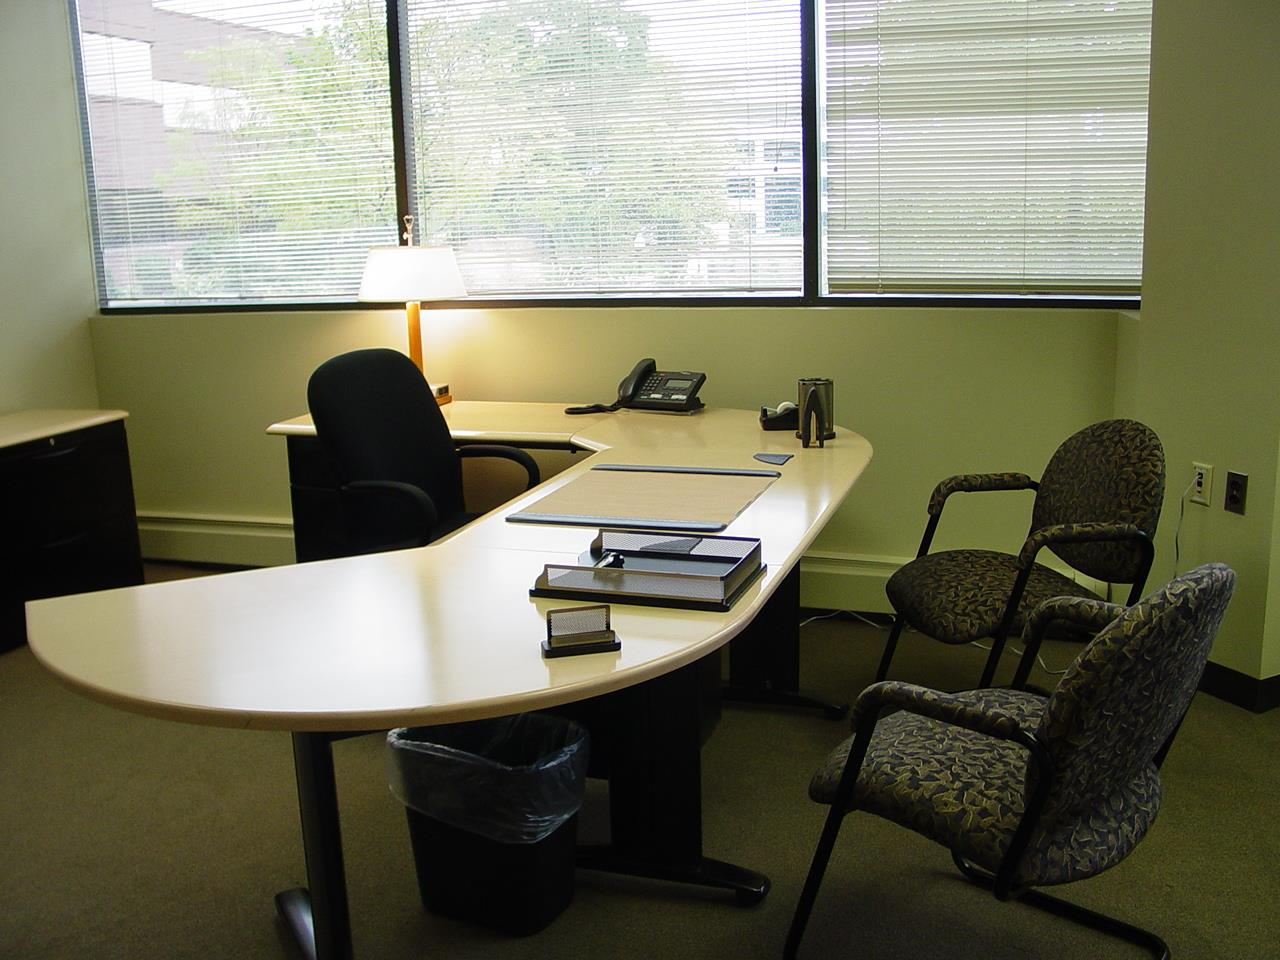 Intelligent Office 525 Rt 73 N Marlton NJ - OFFICE #106